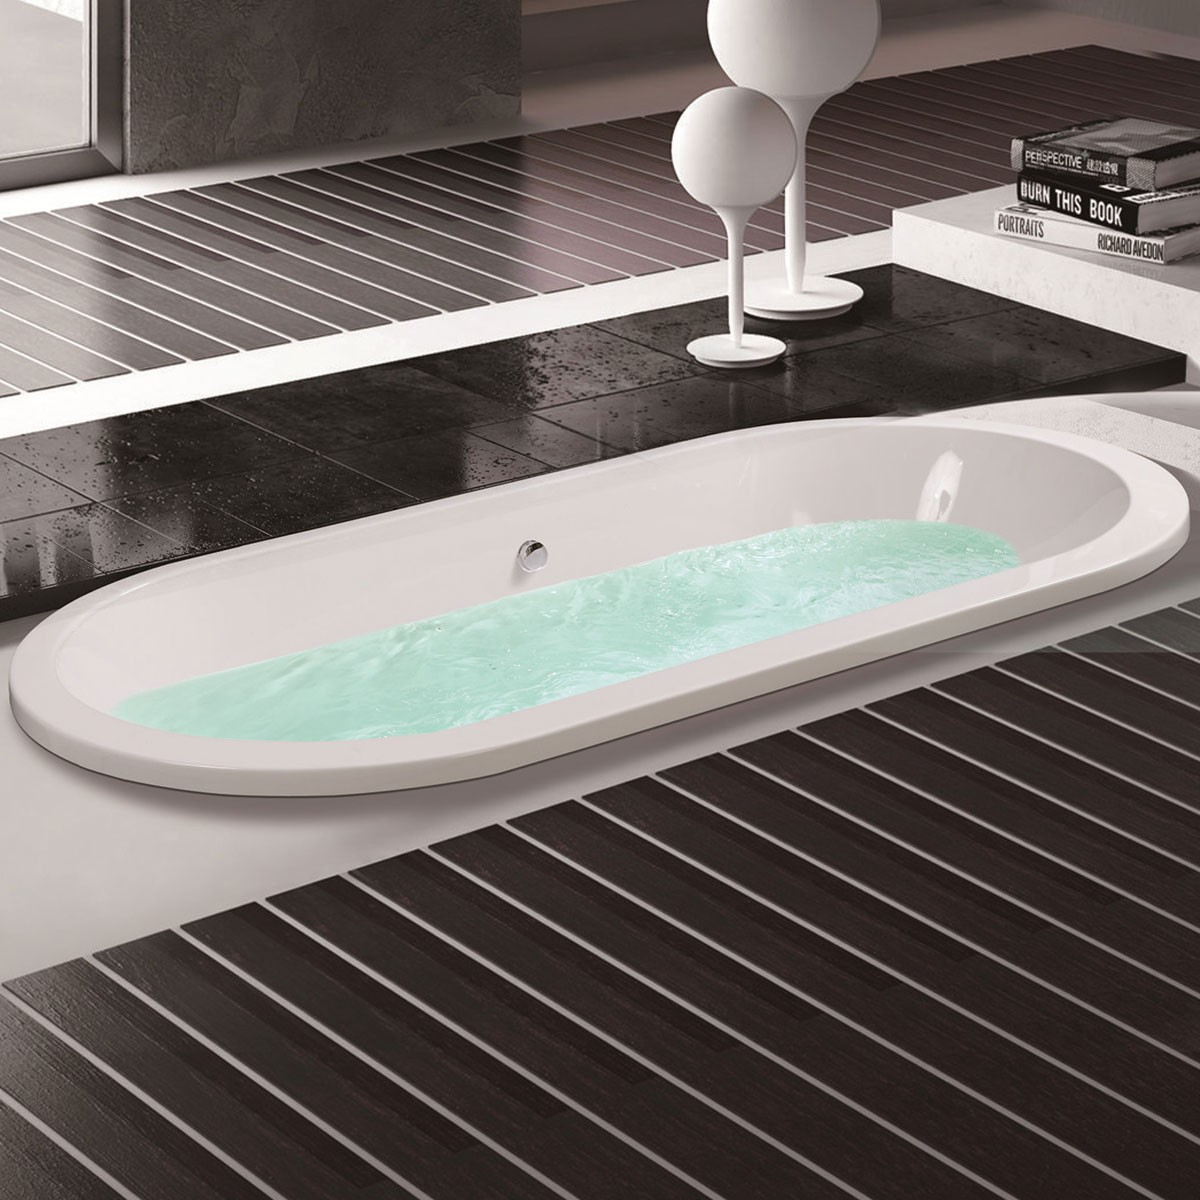 60 po baignoire encastrable blanche en acrylique de salle de bain dk mec3120a decoraport canada Baignoire acrylique salle bains